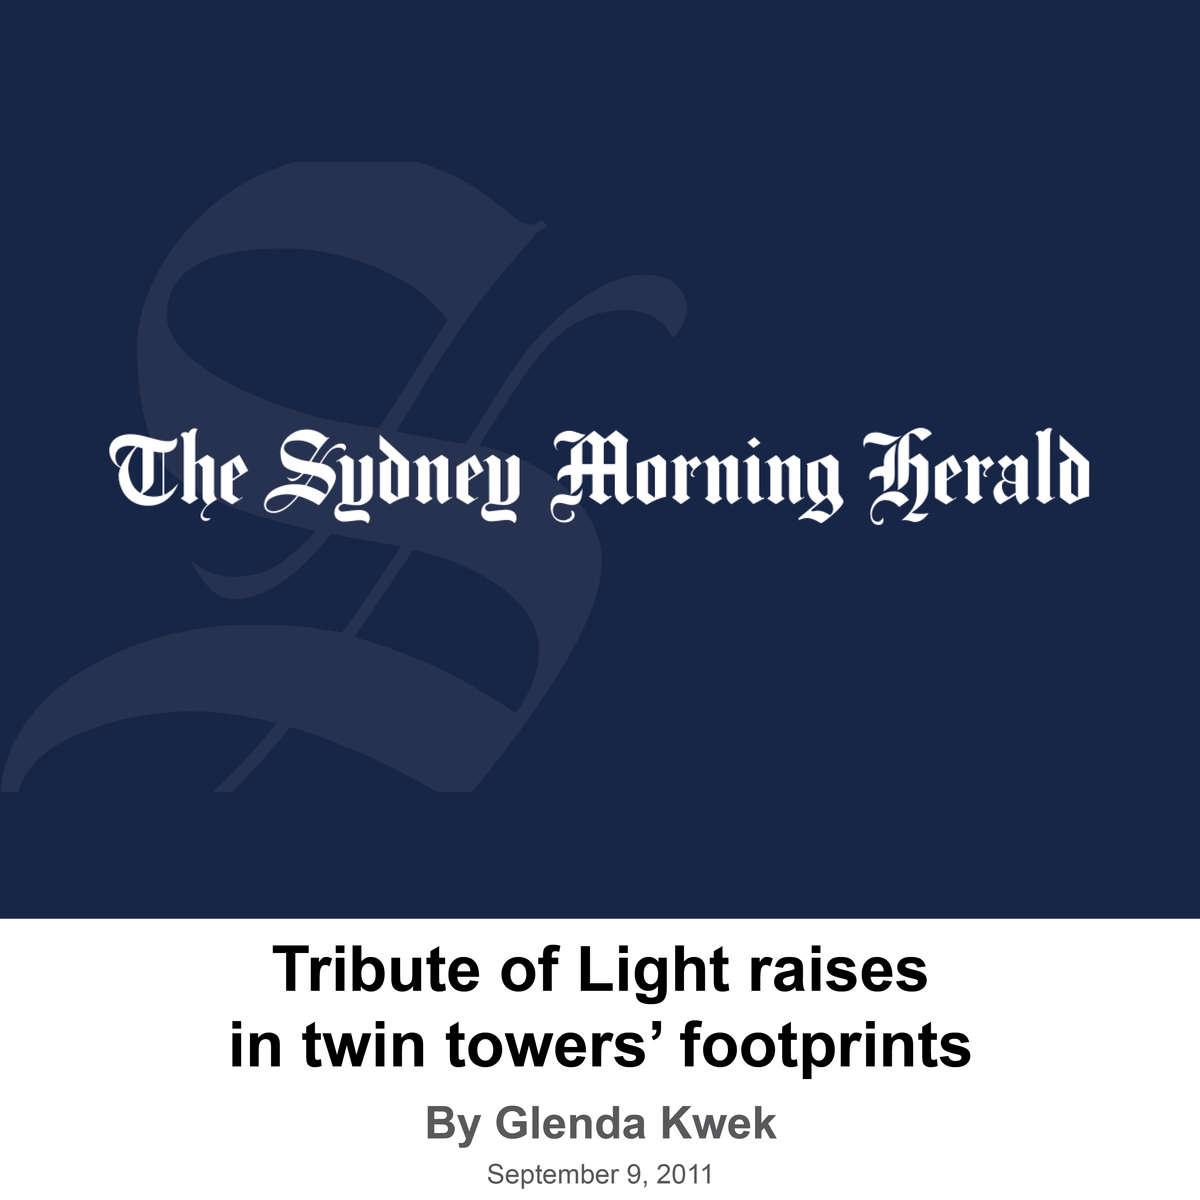 Sydney Herald